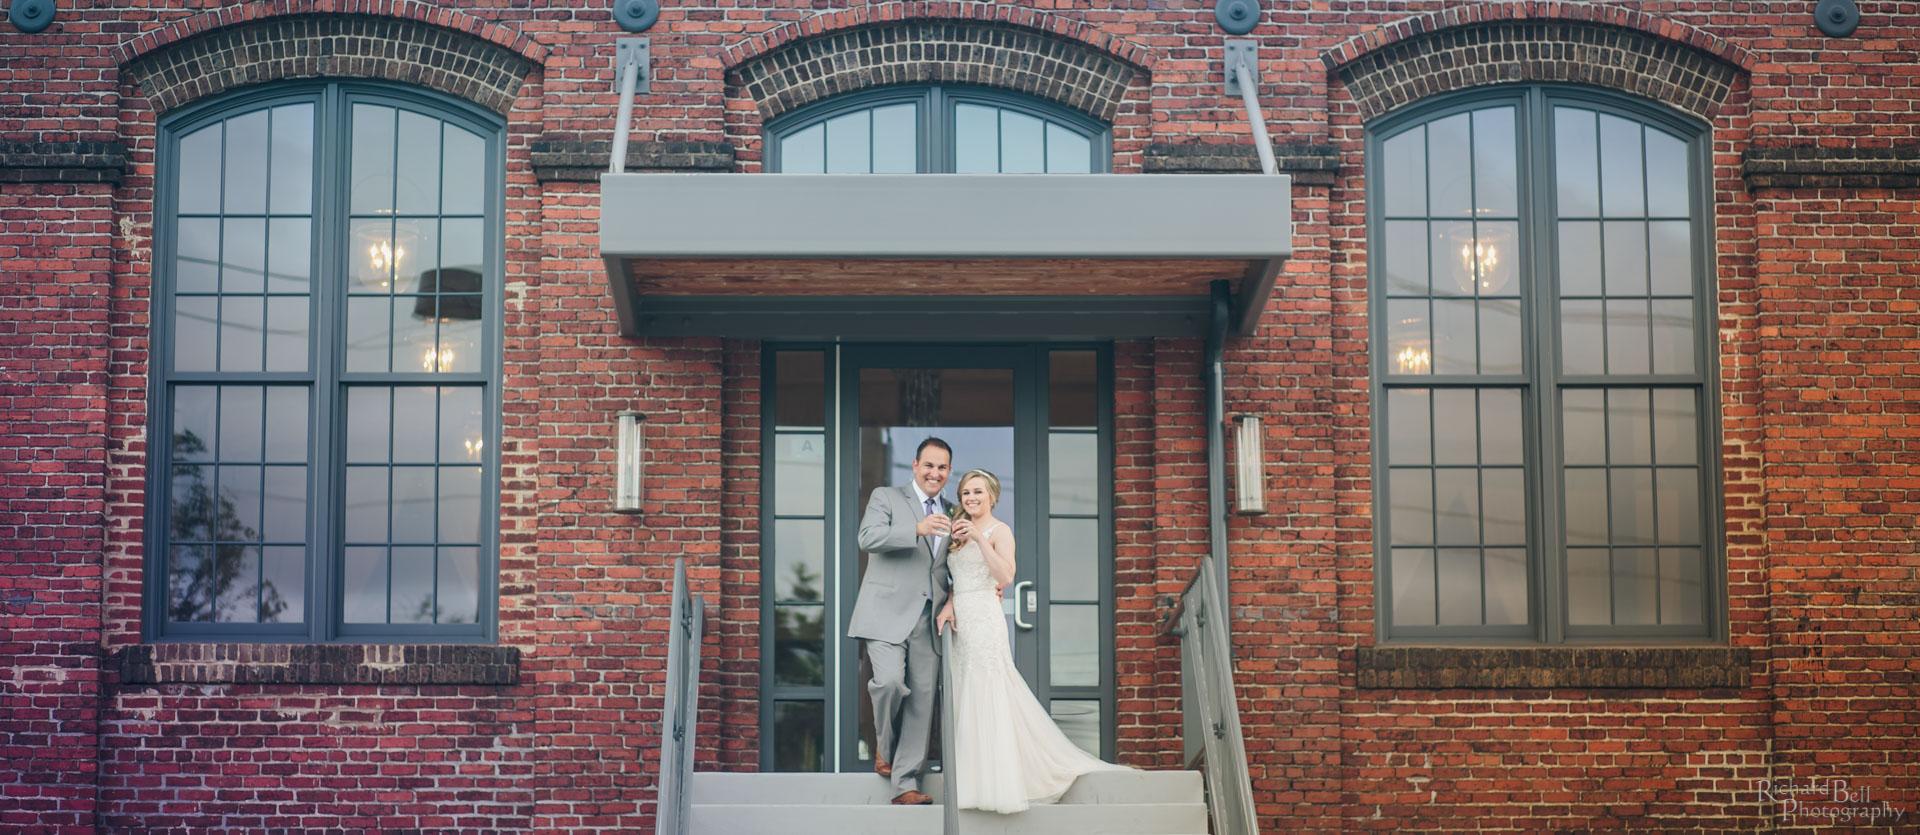 Cedar Room Bride and Groom